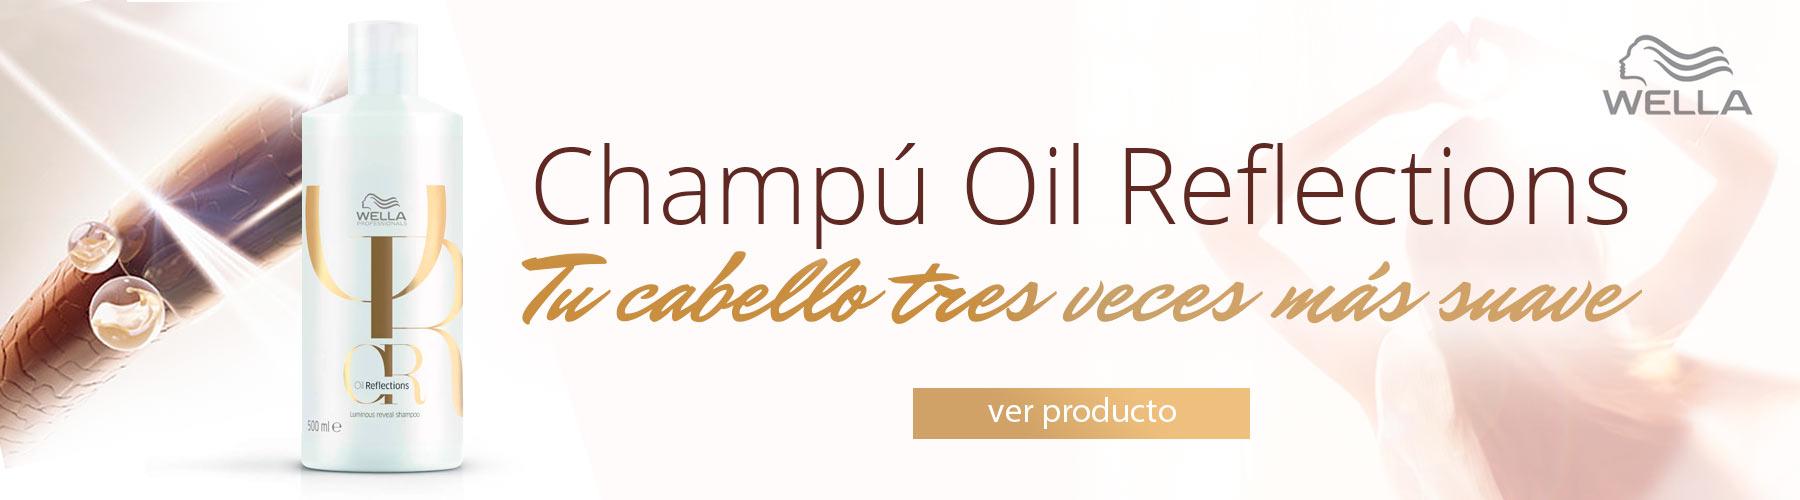 Champú Wella